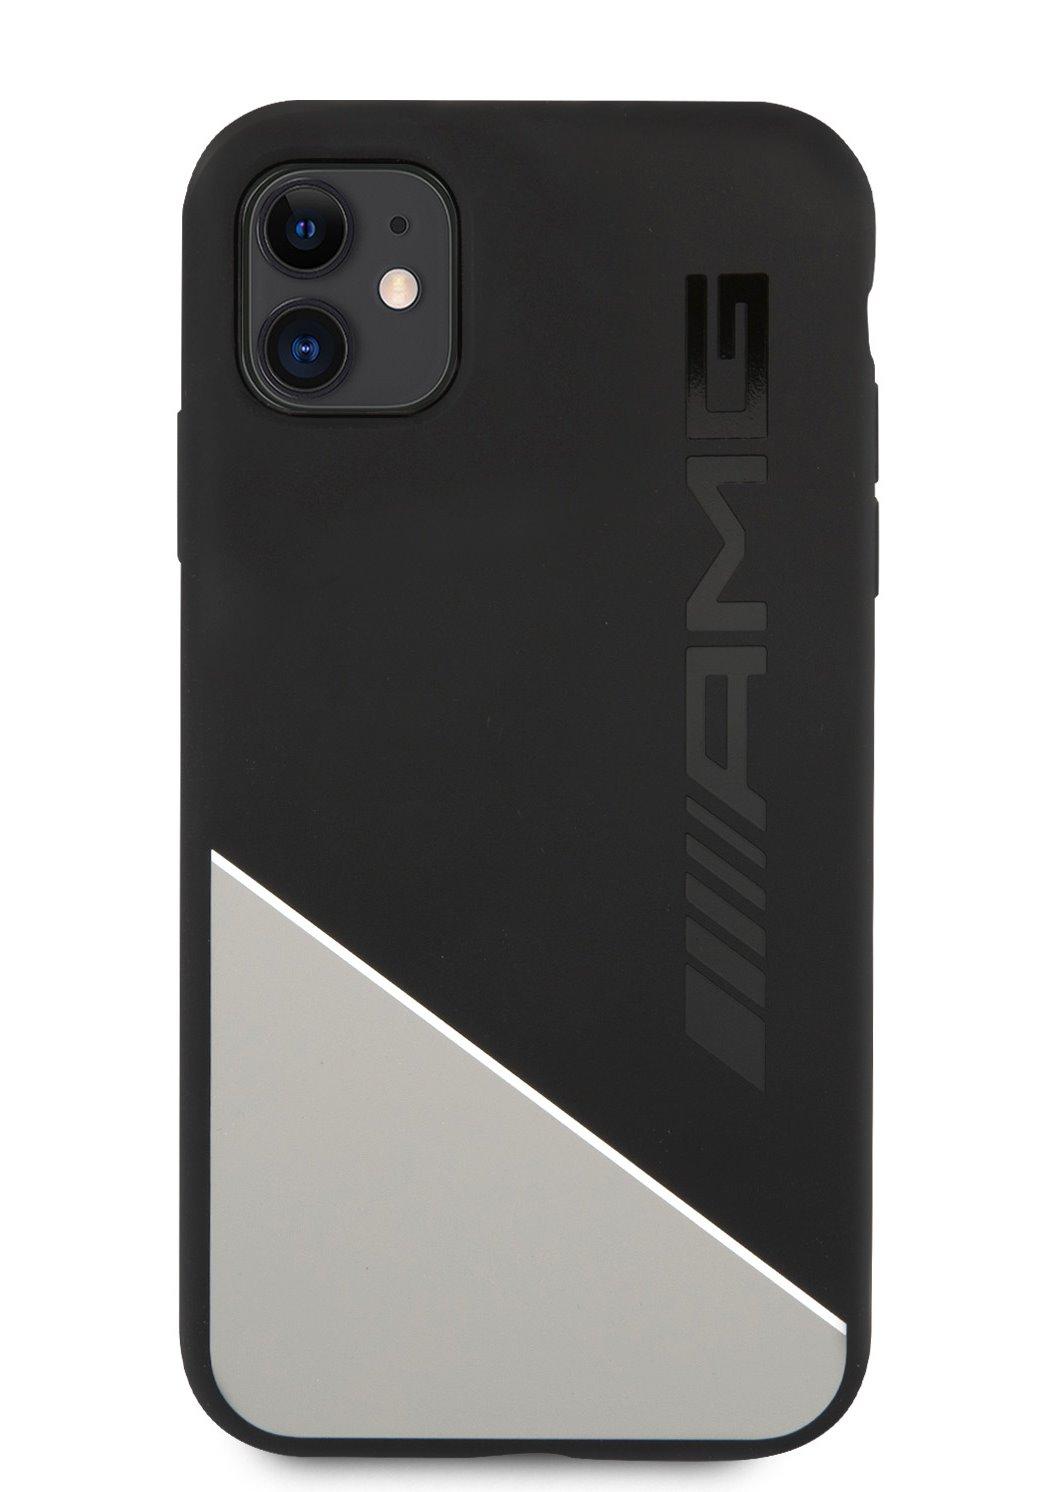 AMHCN61WGDBK AMG Liquid Silicone Two Tones Kryt pro iPhone 11 Grey 3700740514382